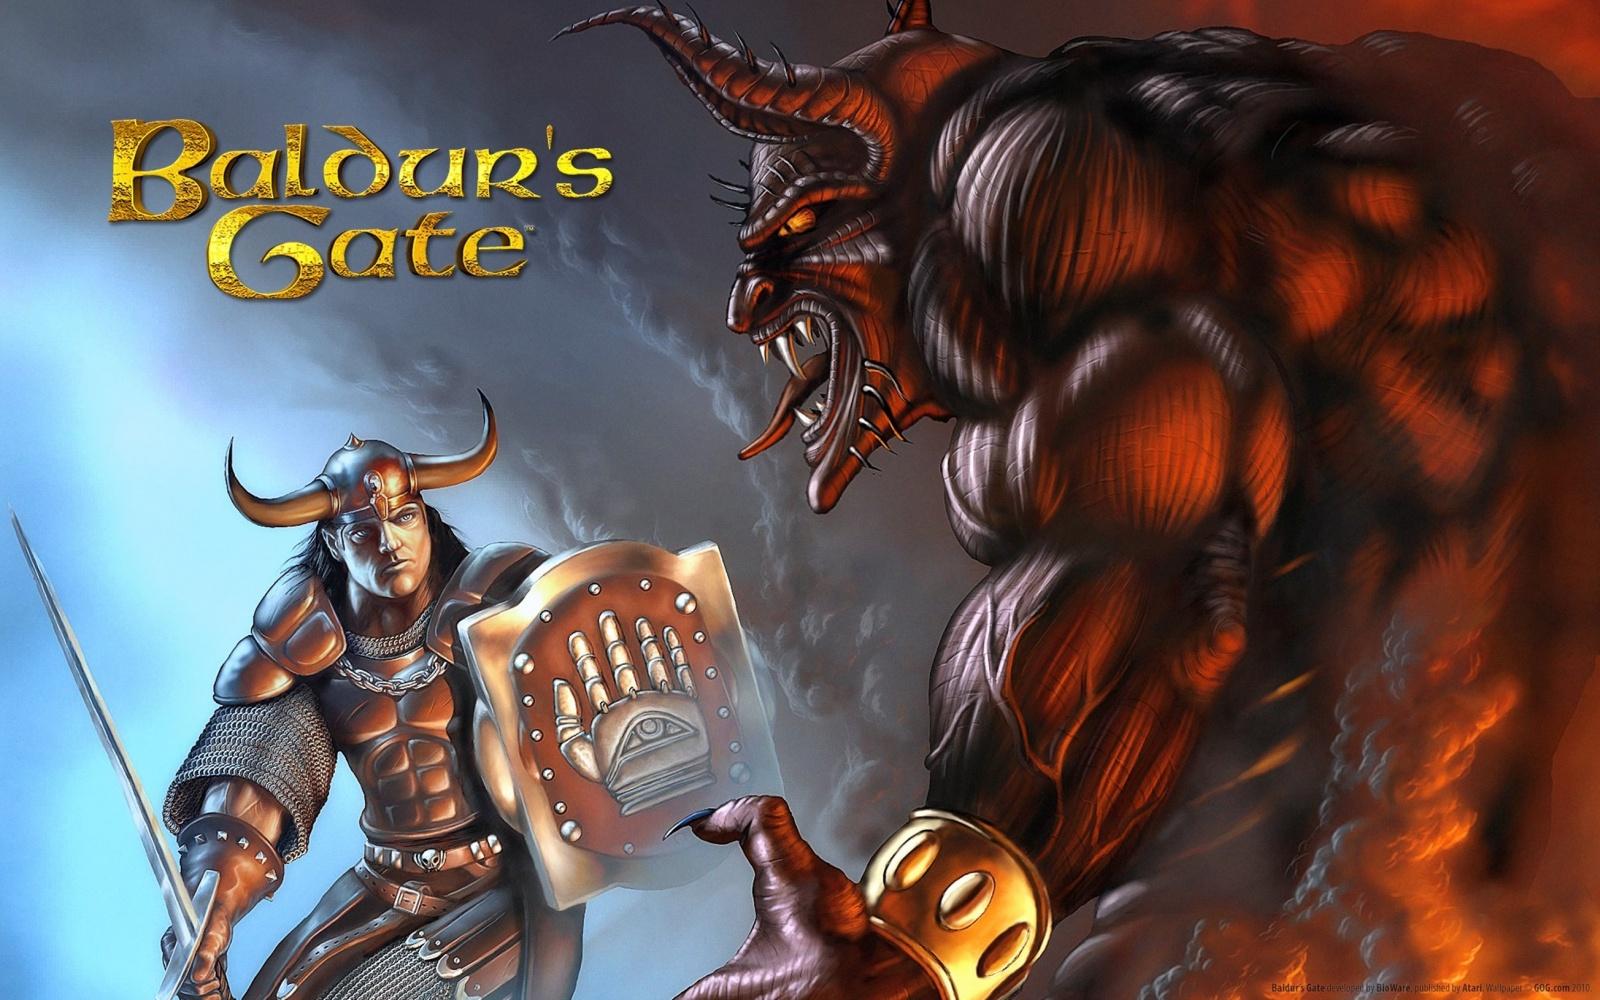 Как Baldur's Gate спас компьютерные RPG - 1